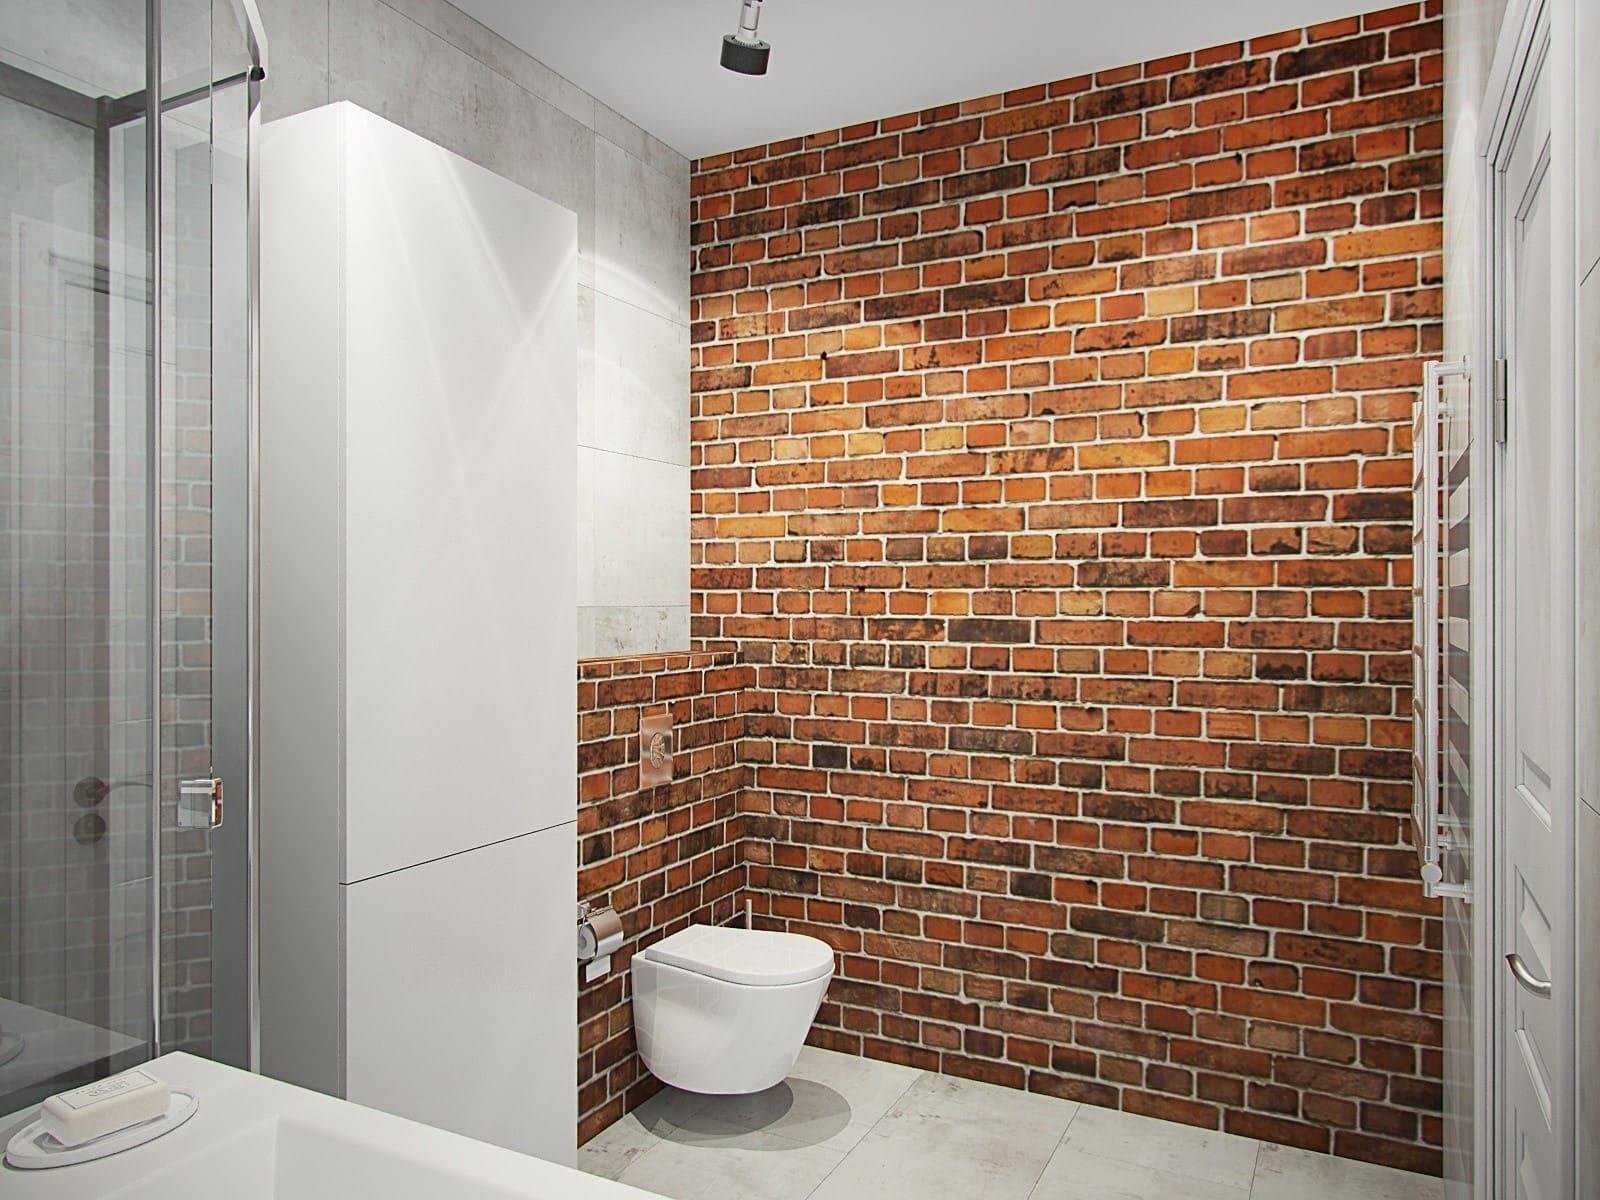 ванная комната стиль лофт италия